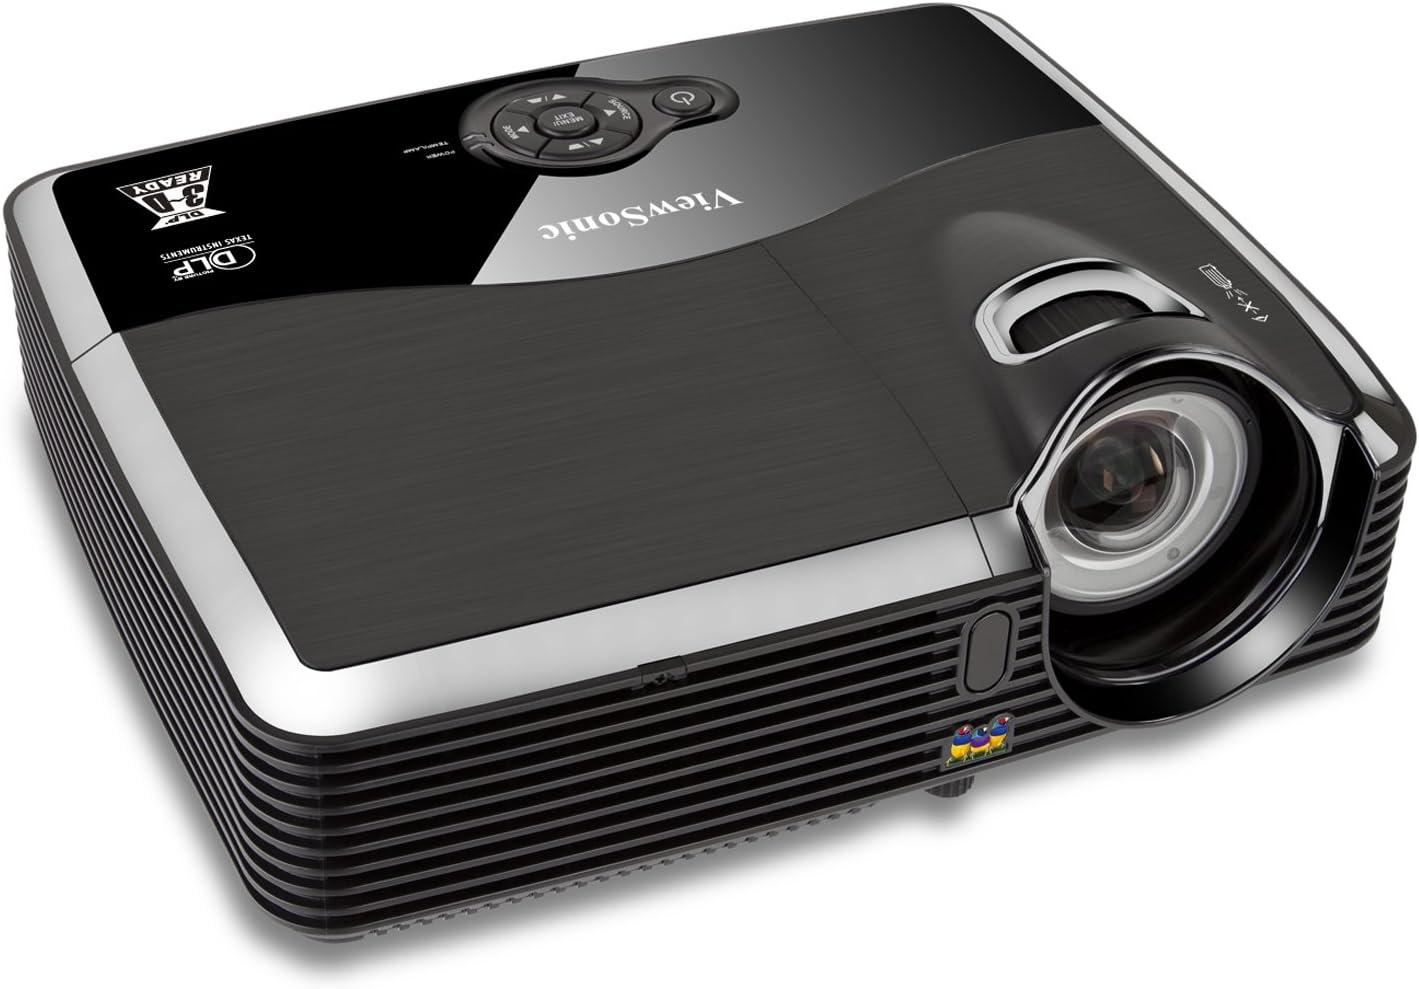 Viewsonic PJD5353 Proyector DLP, negro: Amazon.es: Electrónica